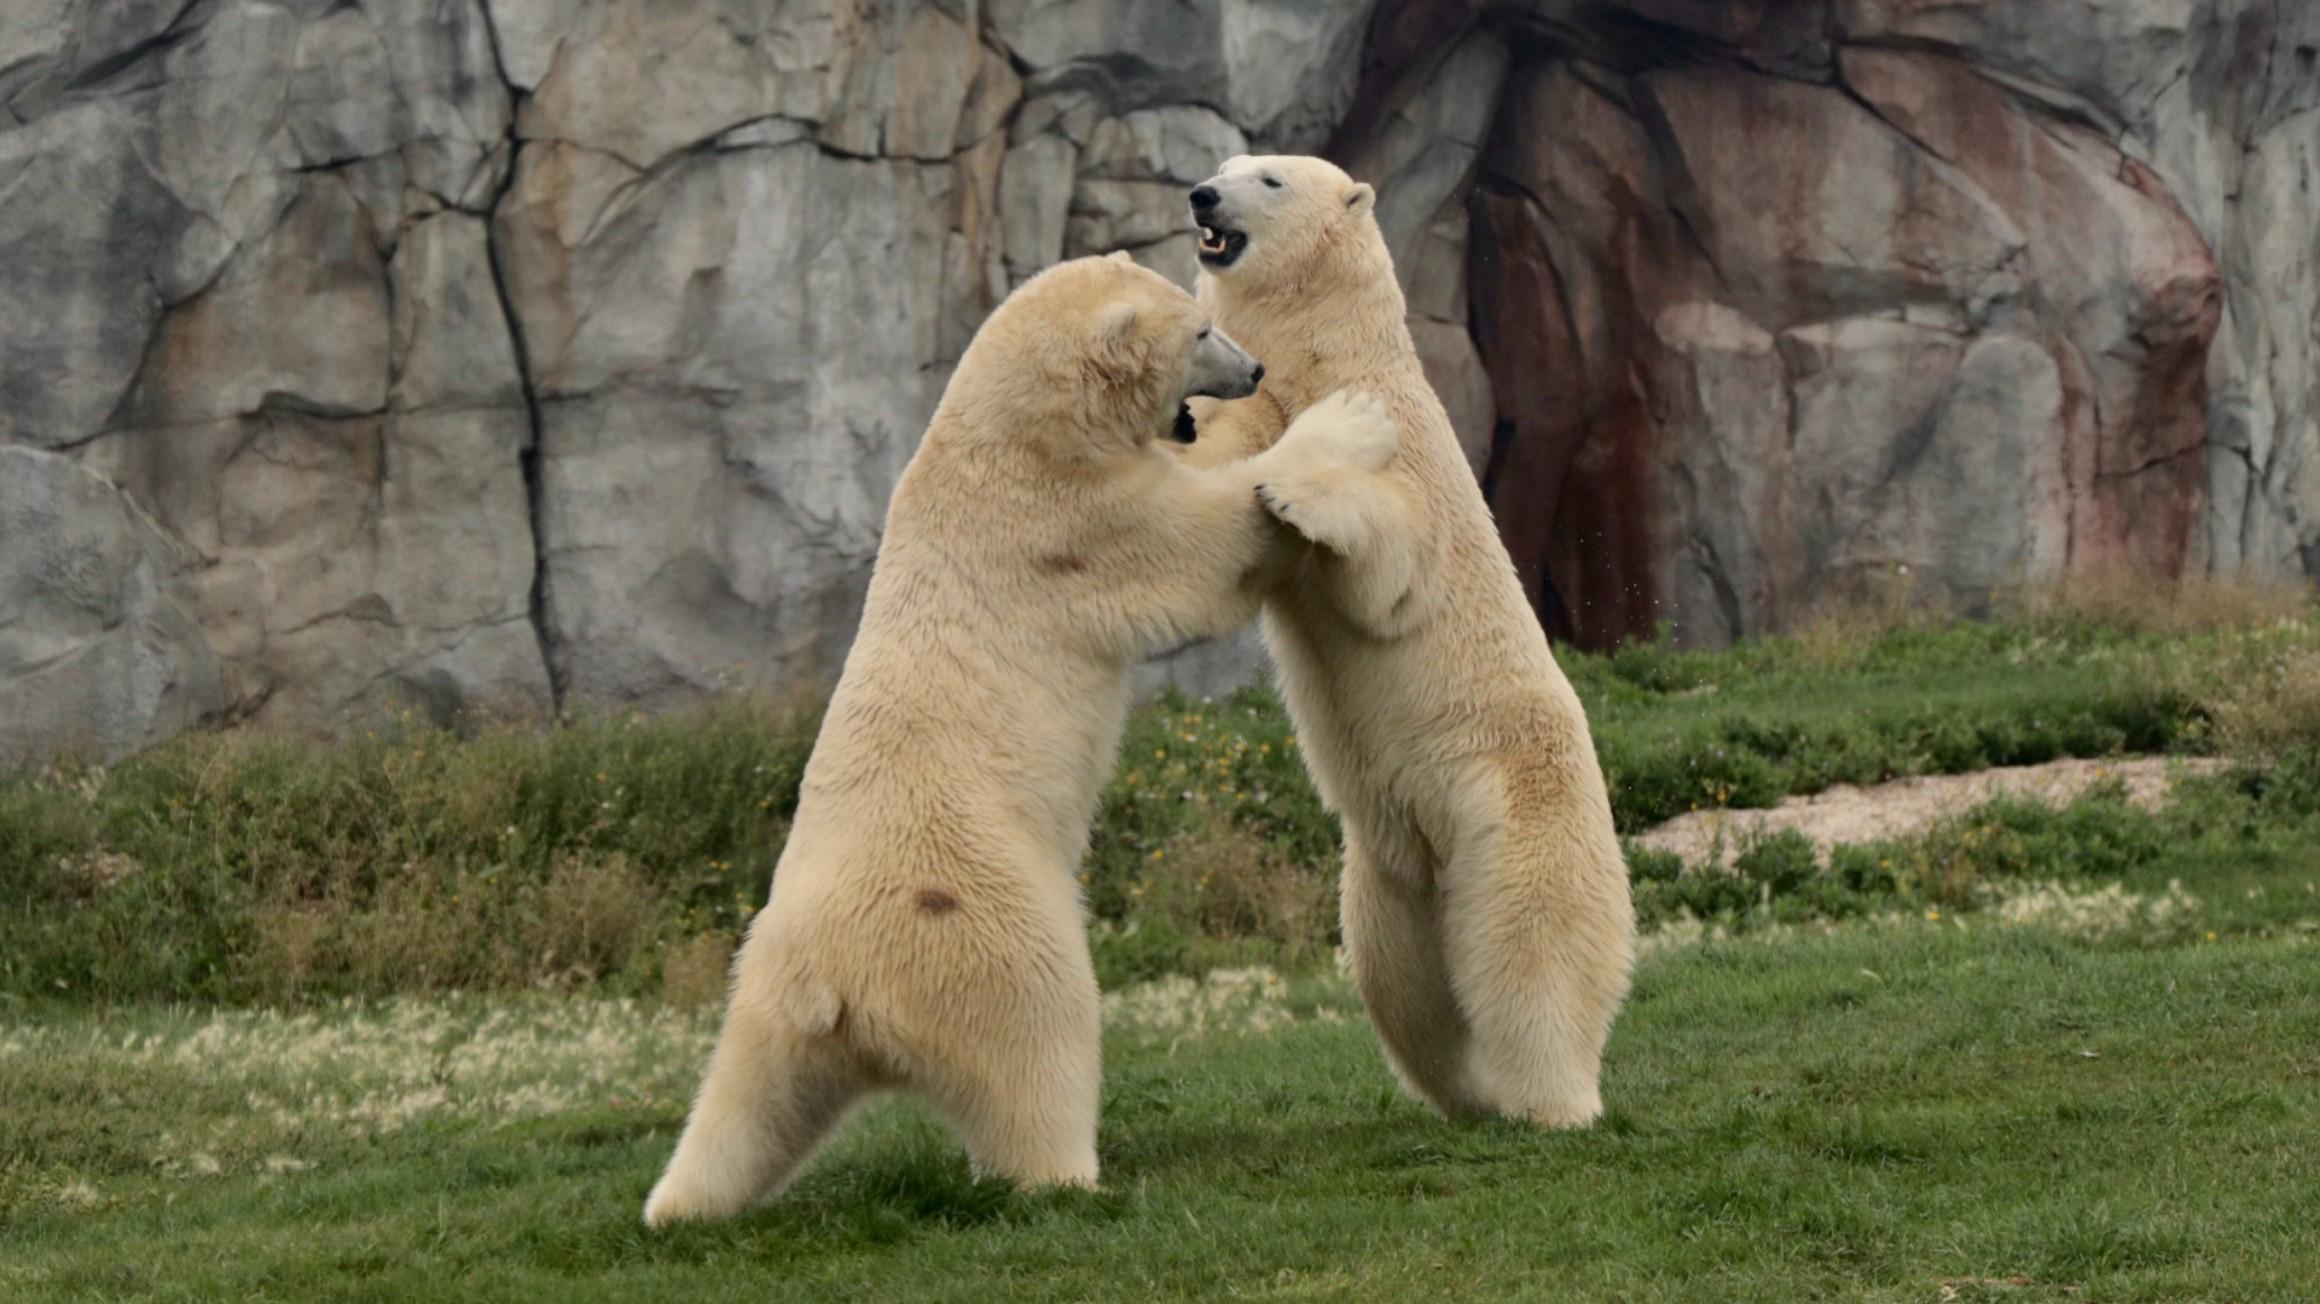 Do polar bears have personalities?